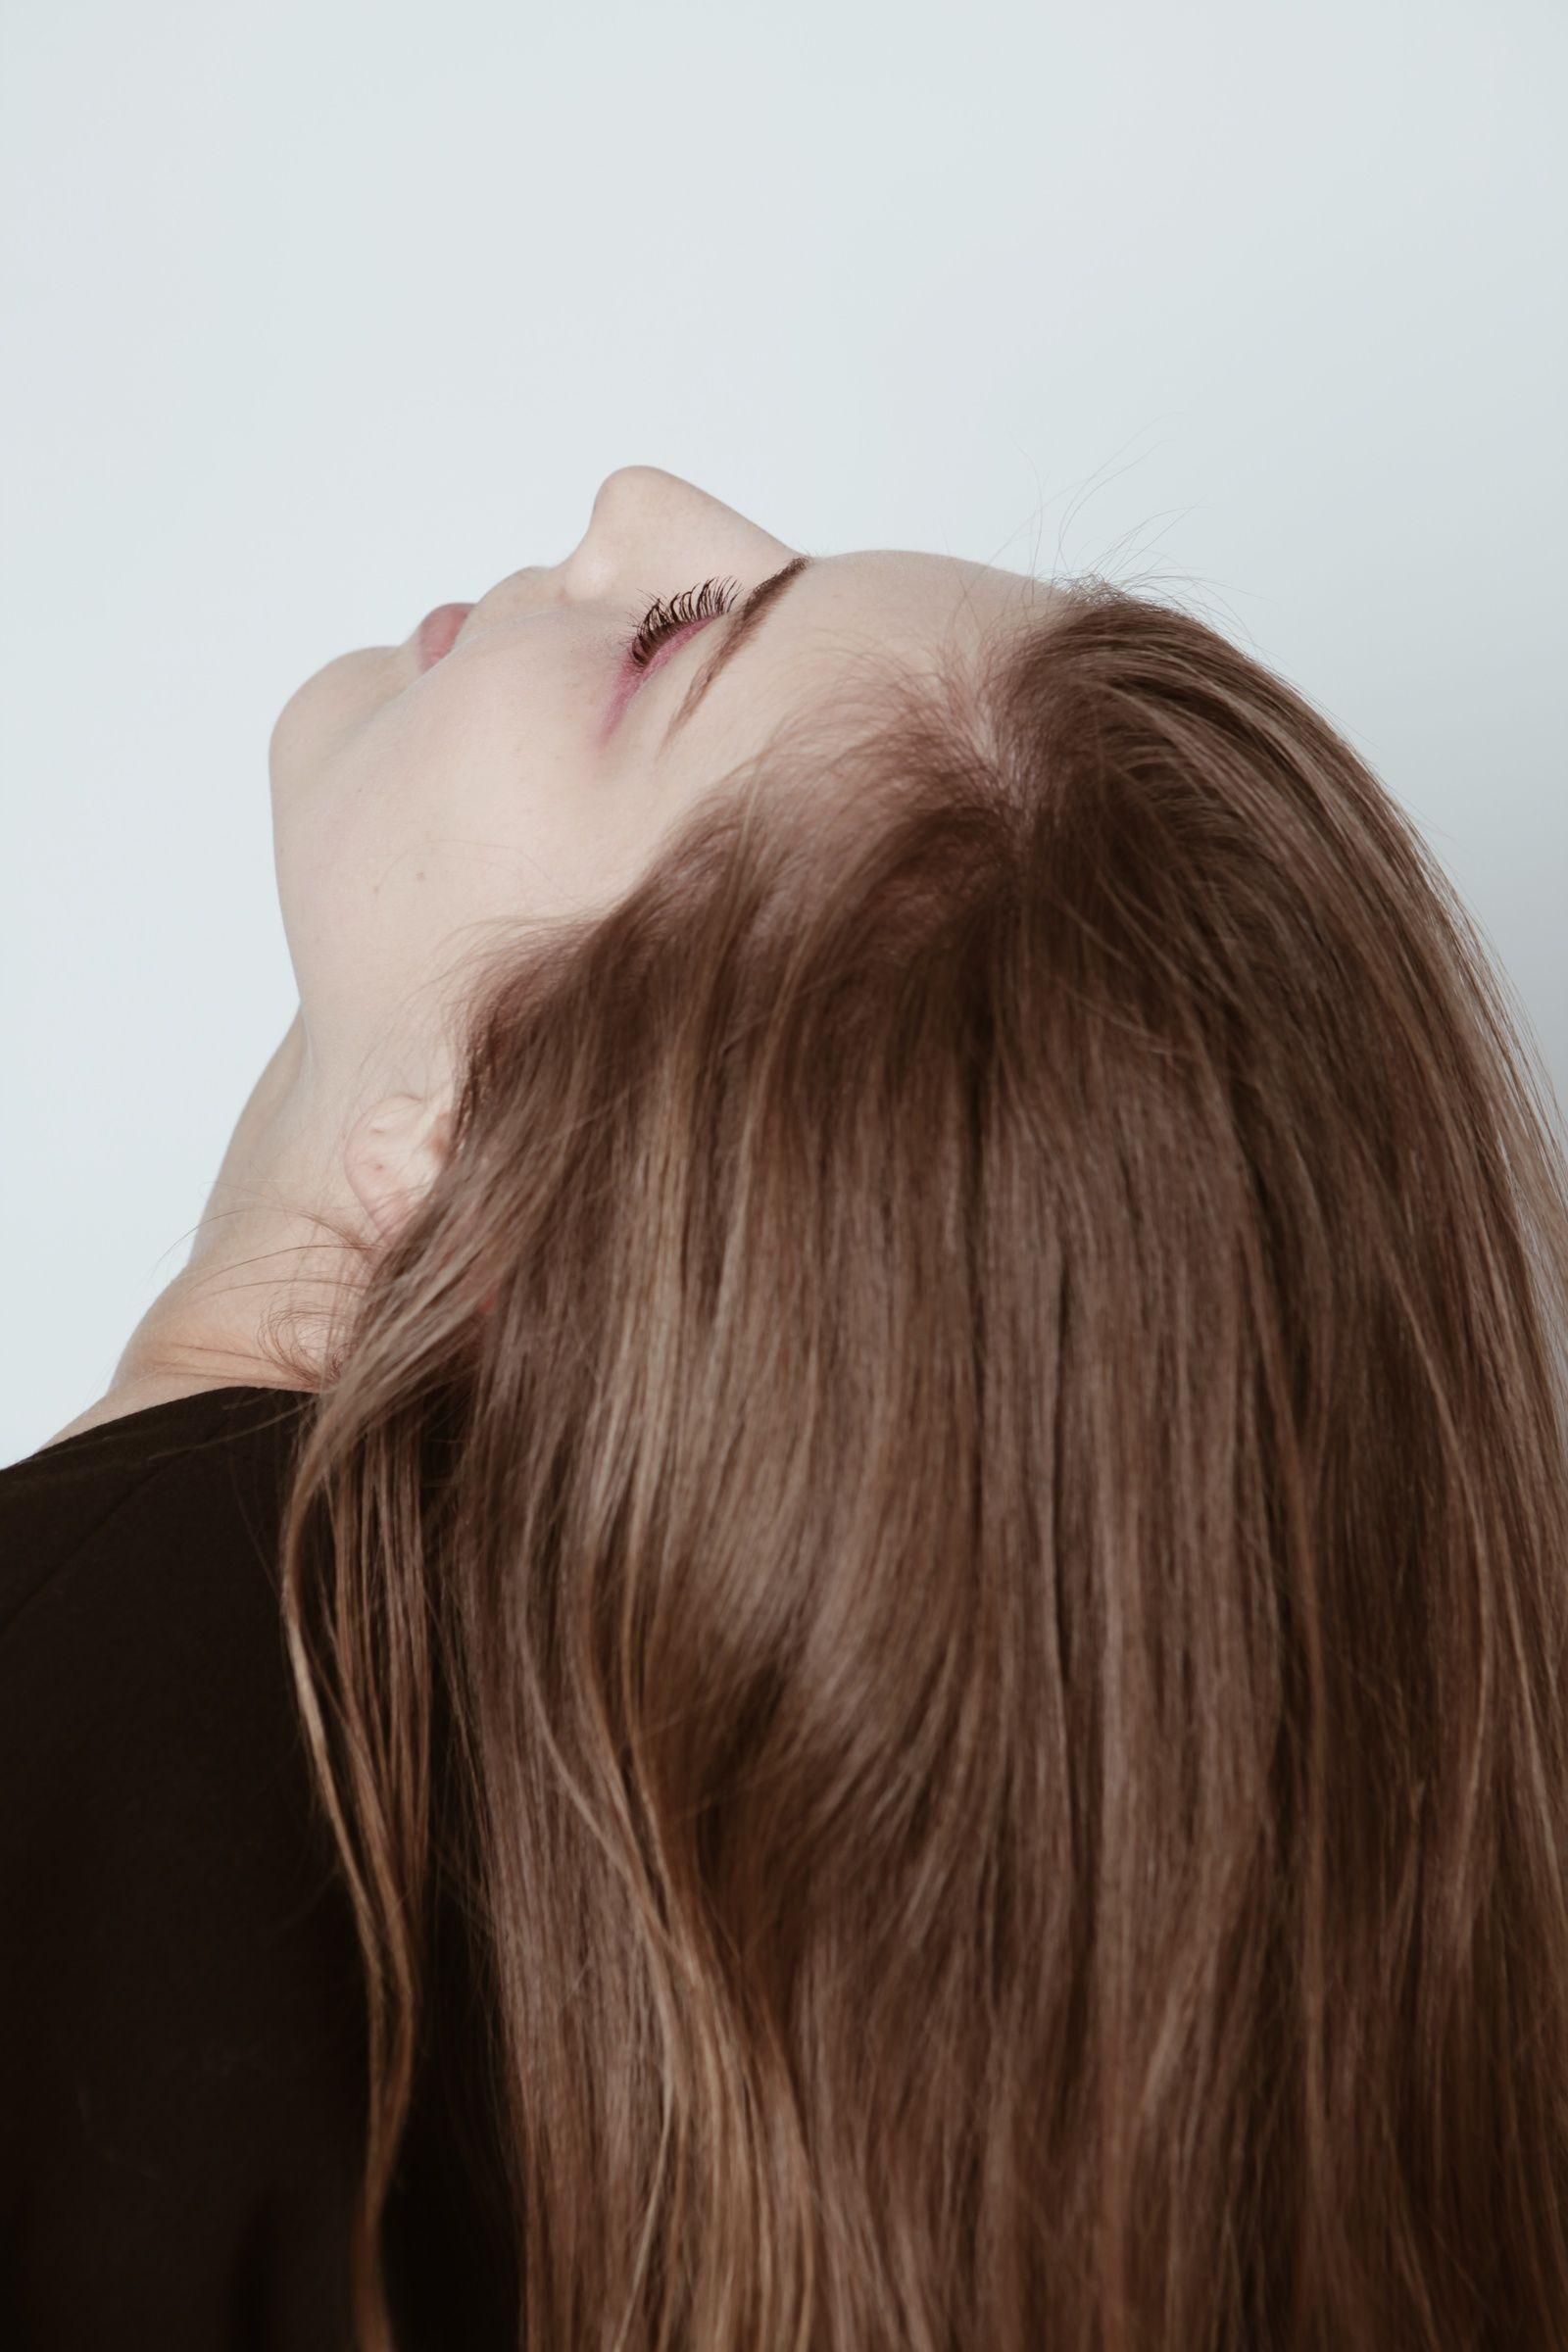 FROM ELSEWEAR Perpetual Solstice Long hair styles